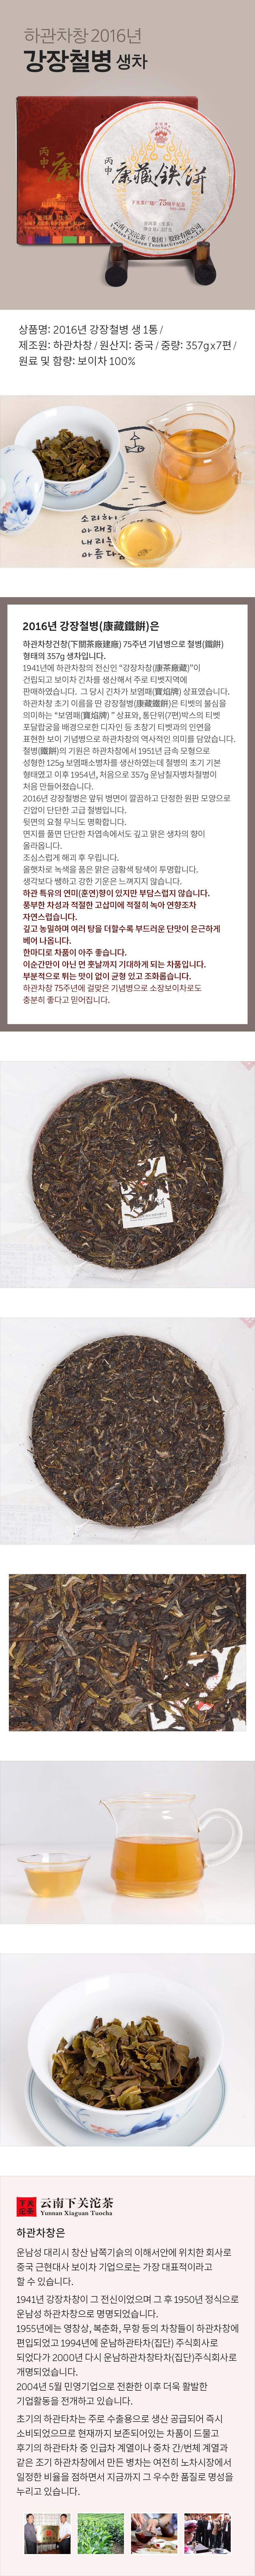 [ CoandF ] (下关沱茶) 2016年康藏铁饼普洱茶(生茶) 1盒(357g x 7p)